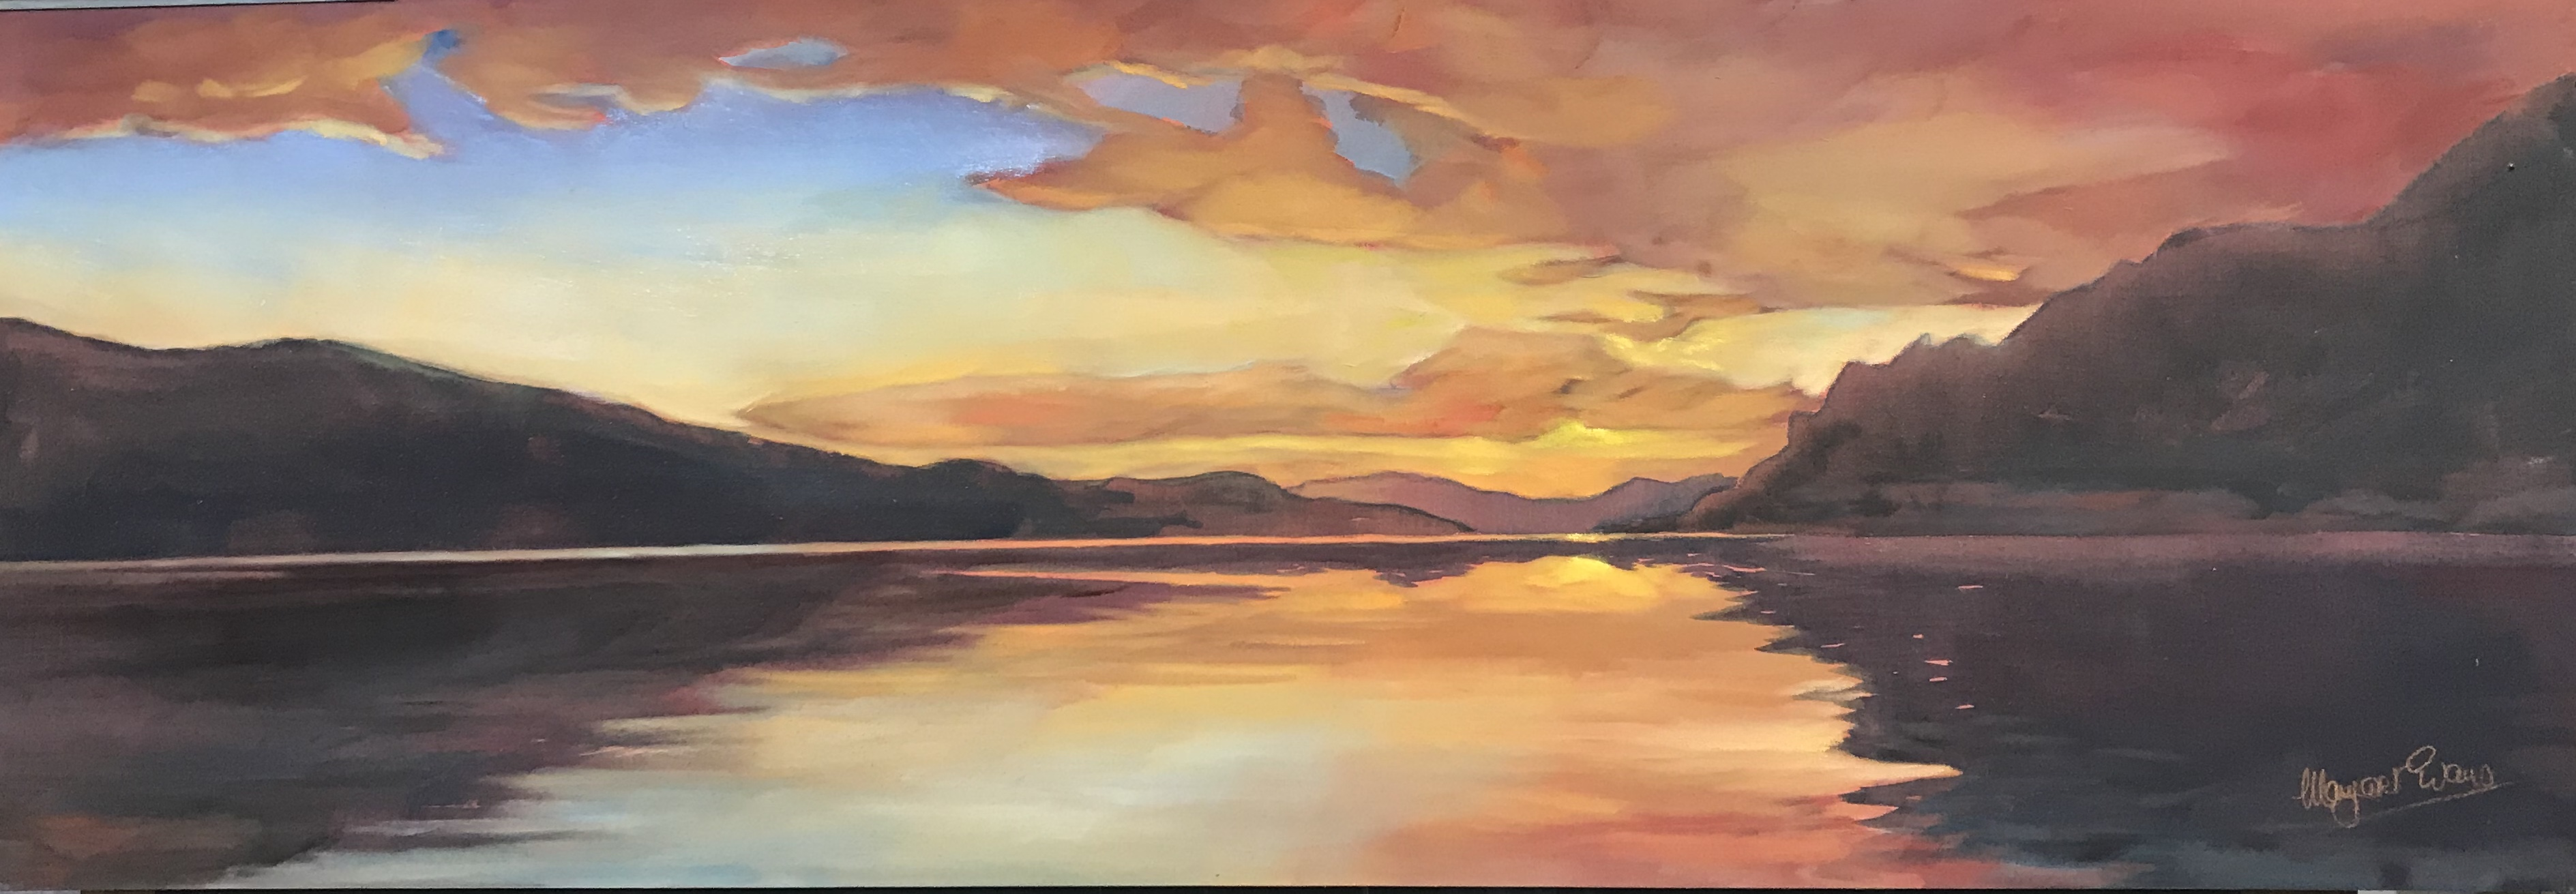 Margaret Evans_Loch Lines at Sunset_Pastel & Gouache_12x36